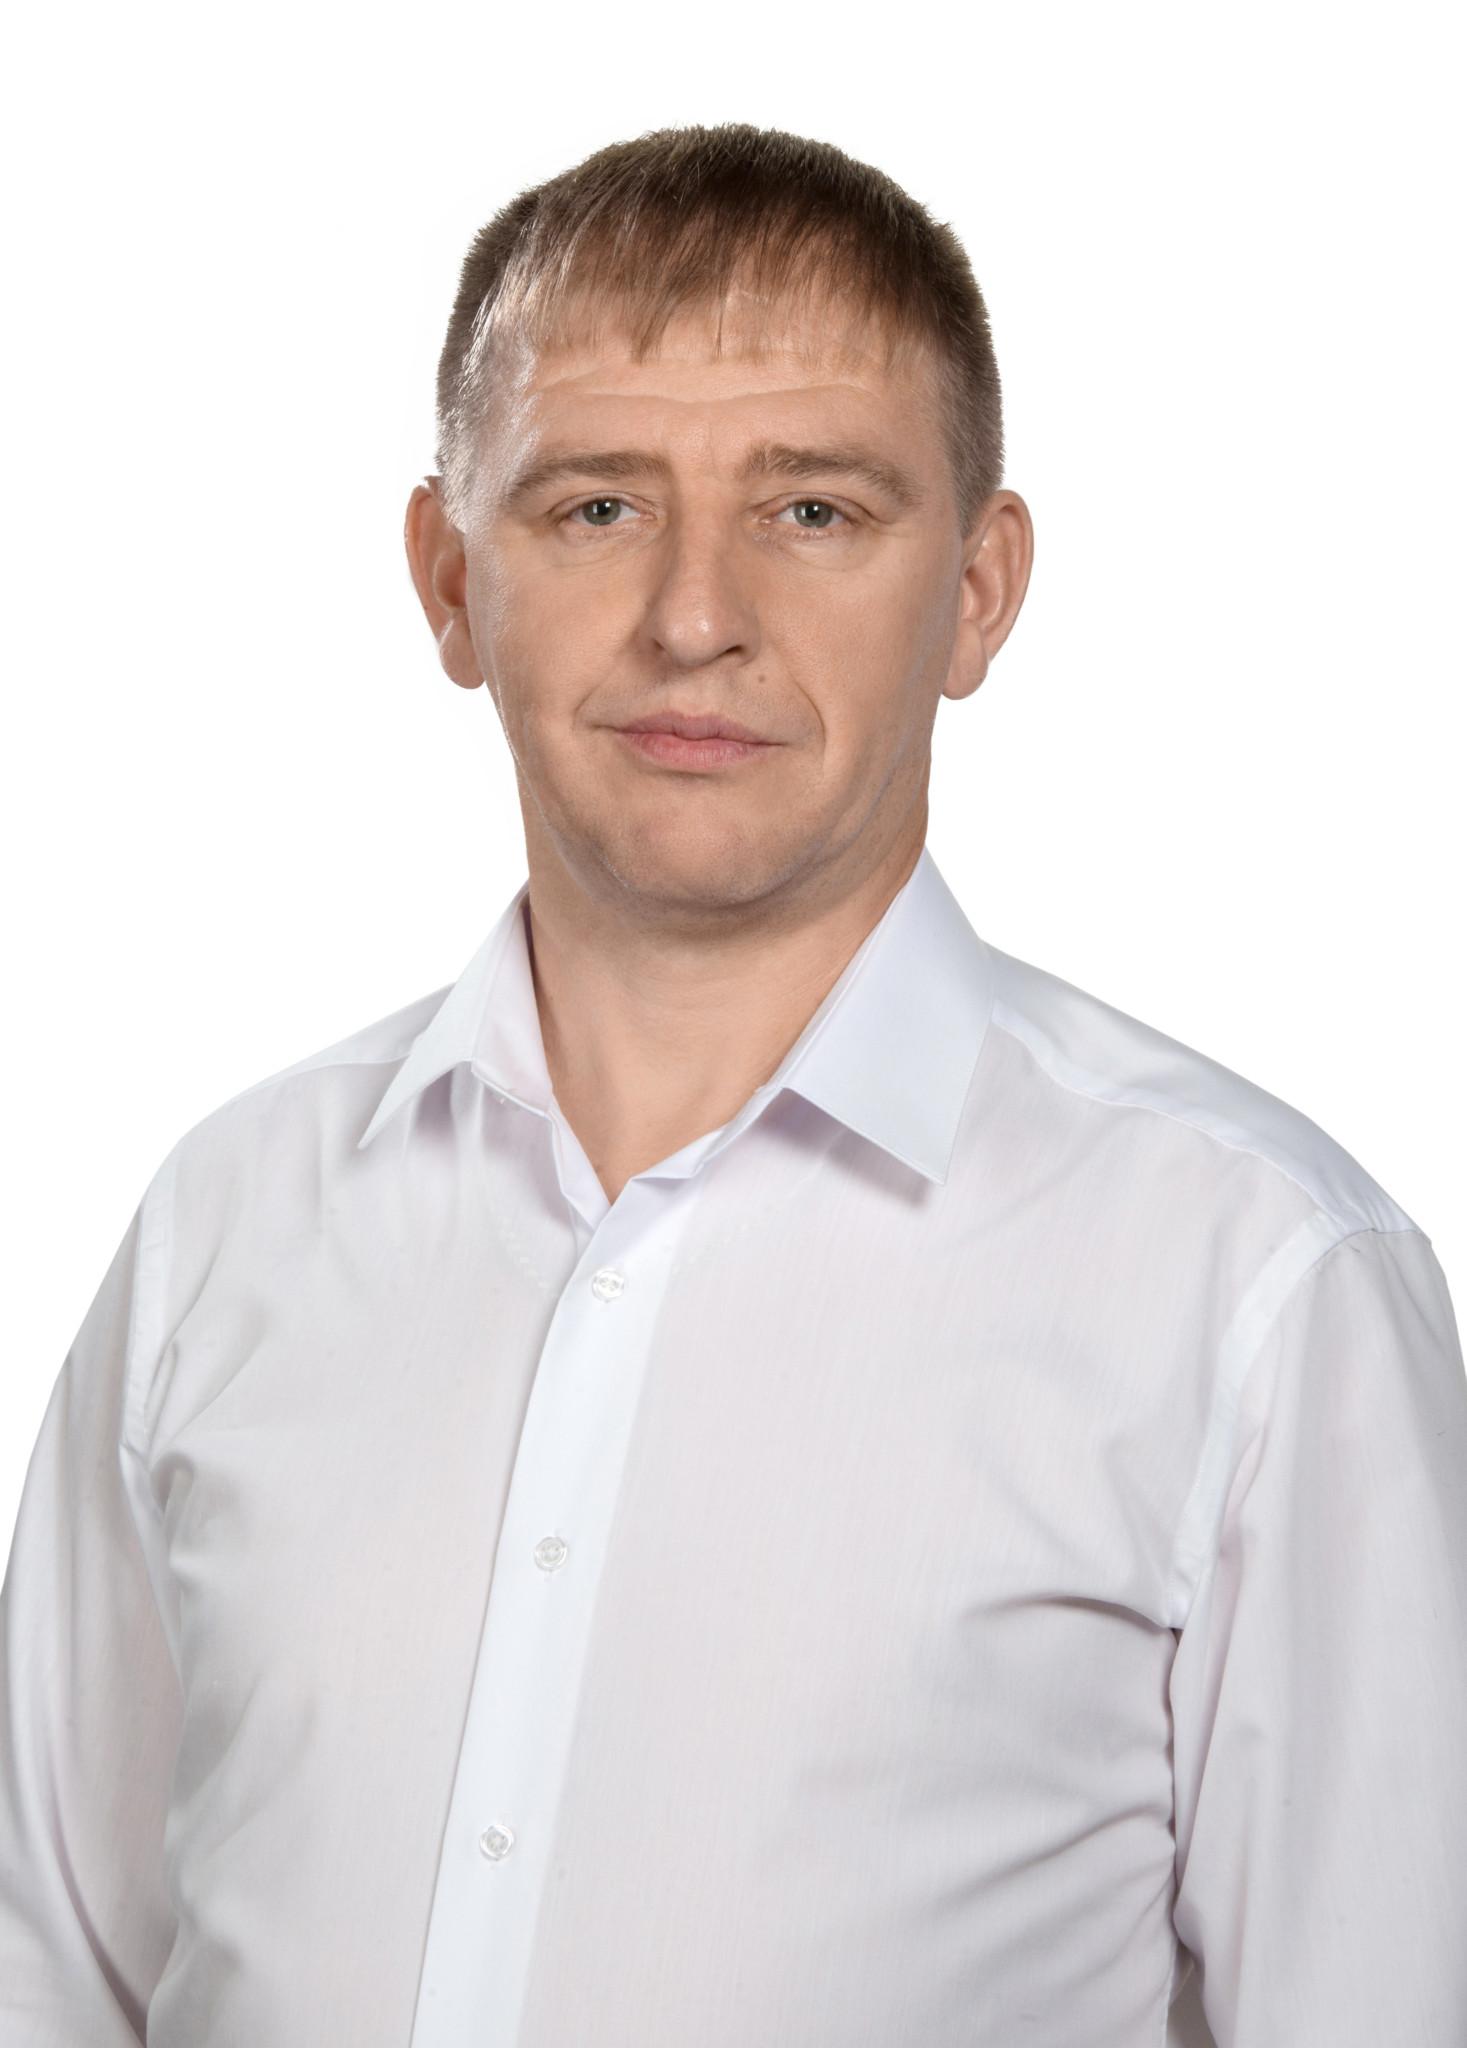 Дячук Олег2